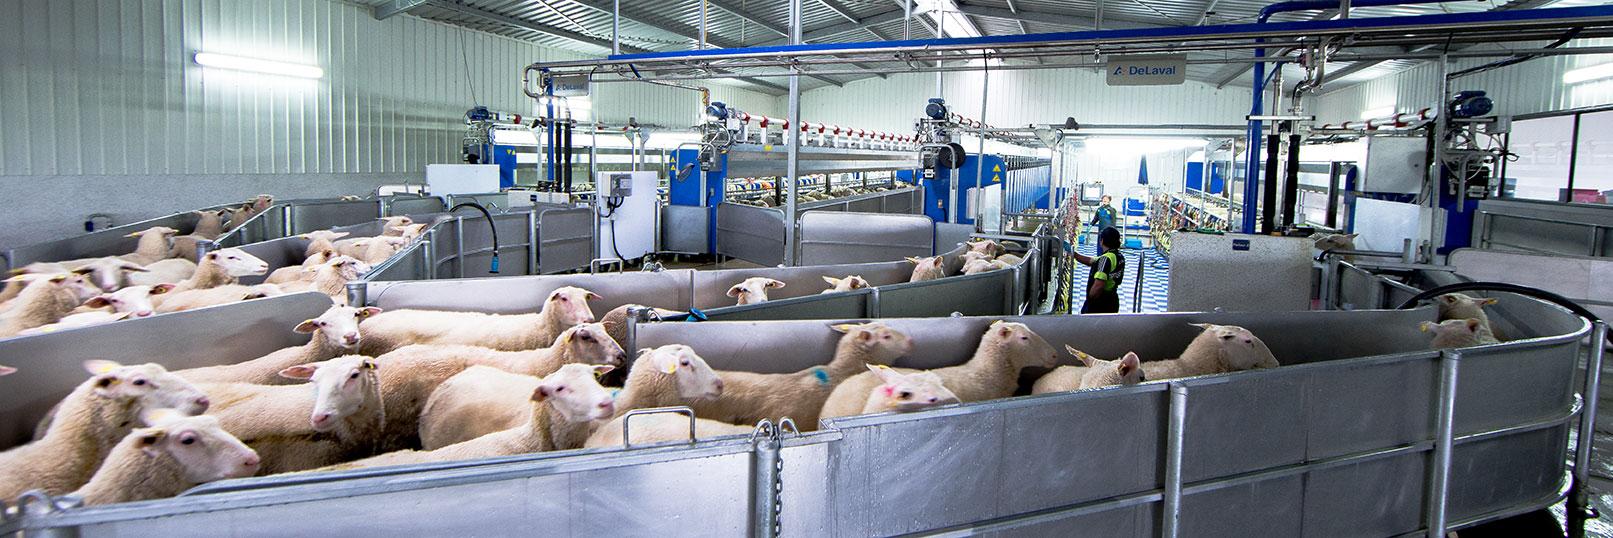 Dairy Sheep   Land Use New Zealand